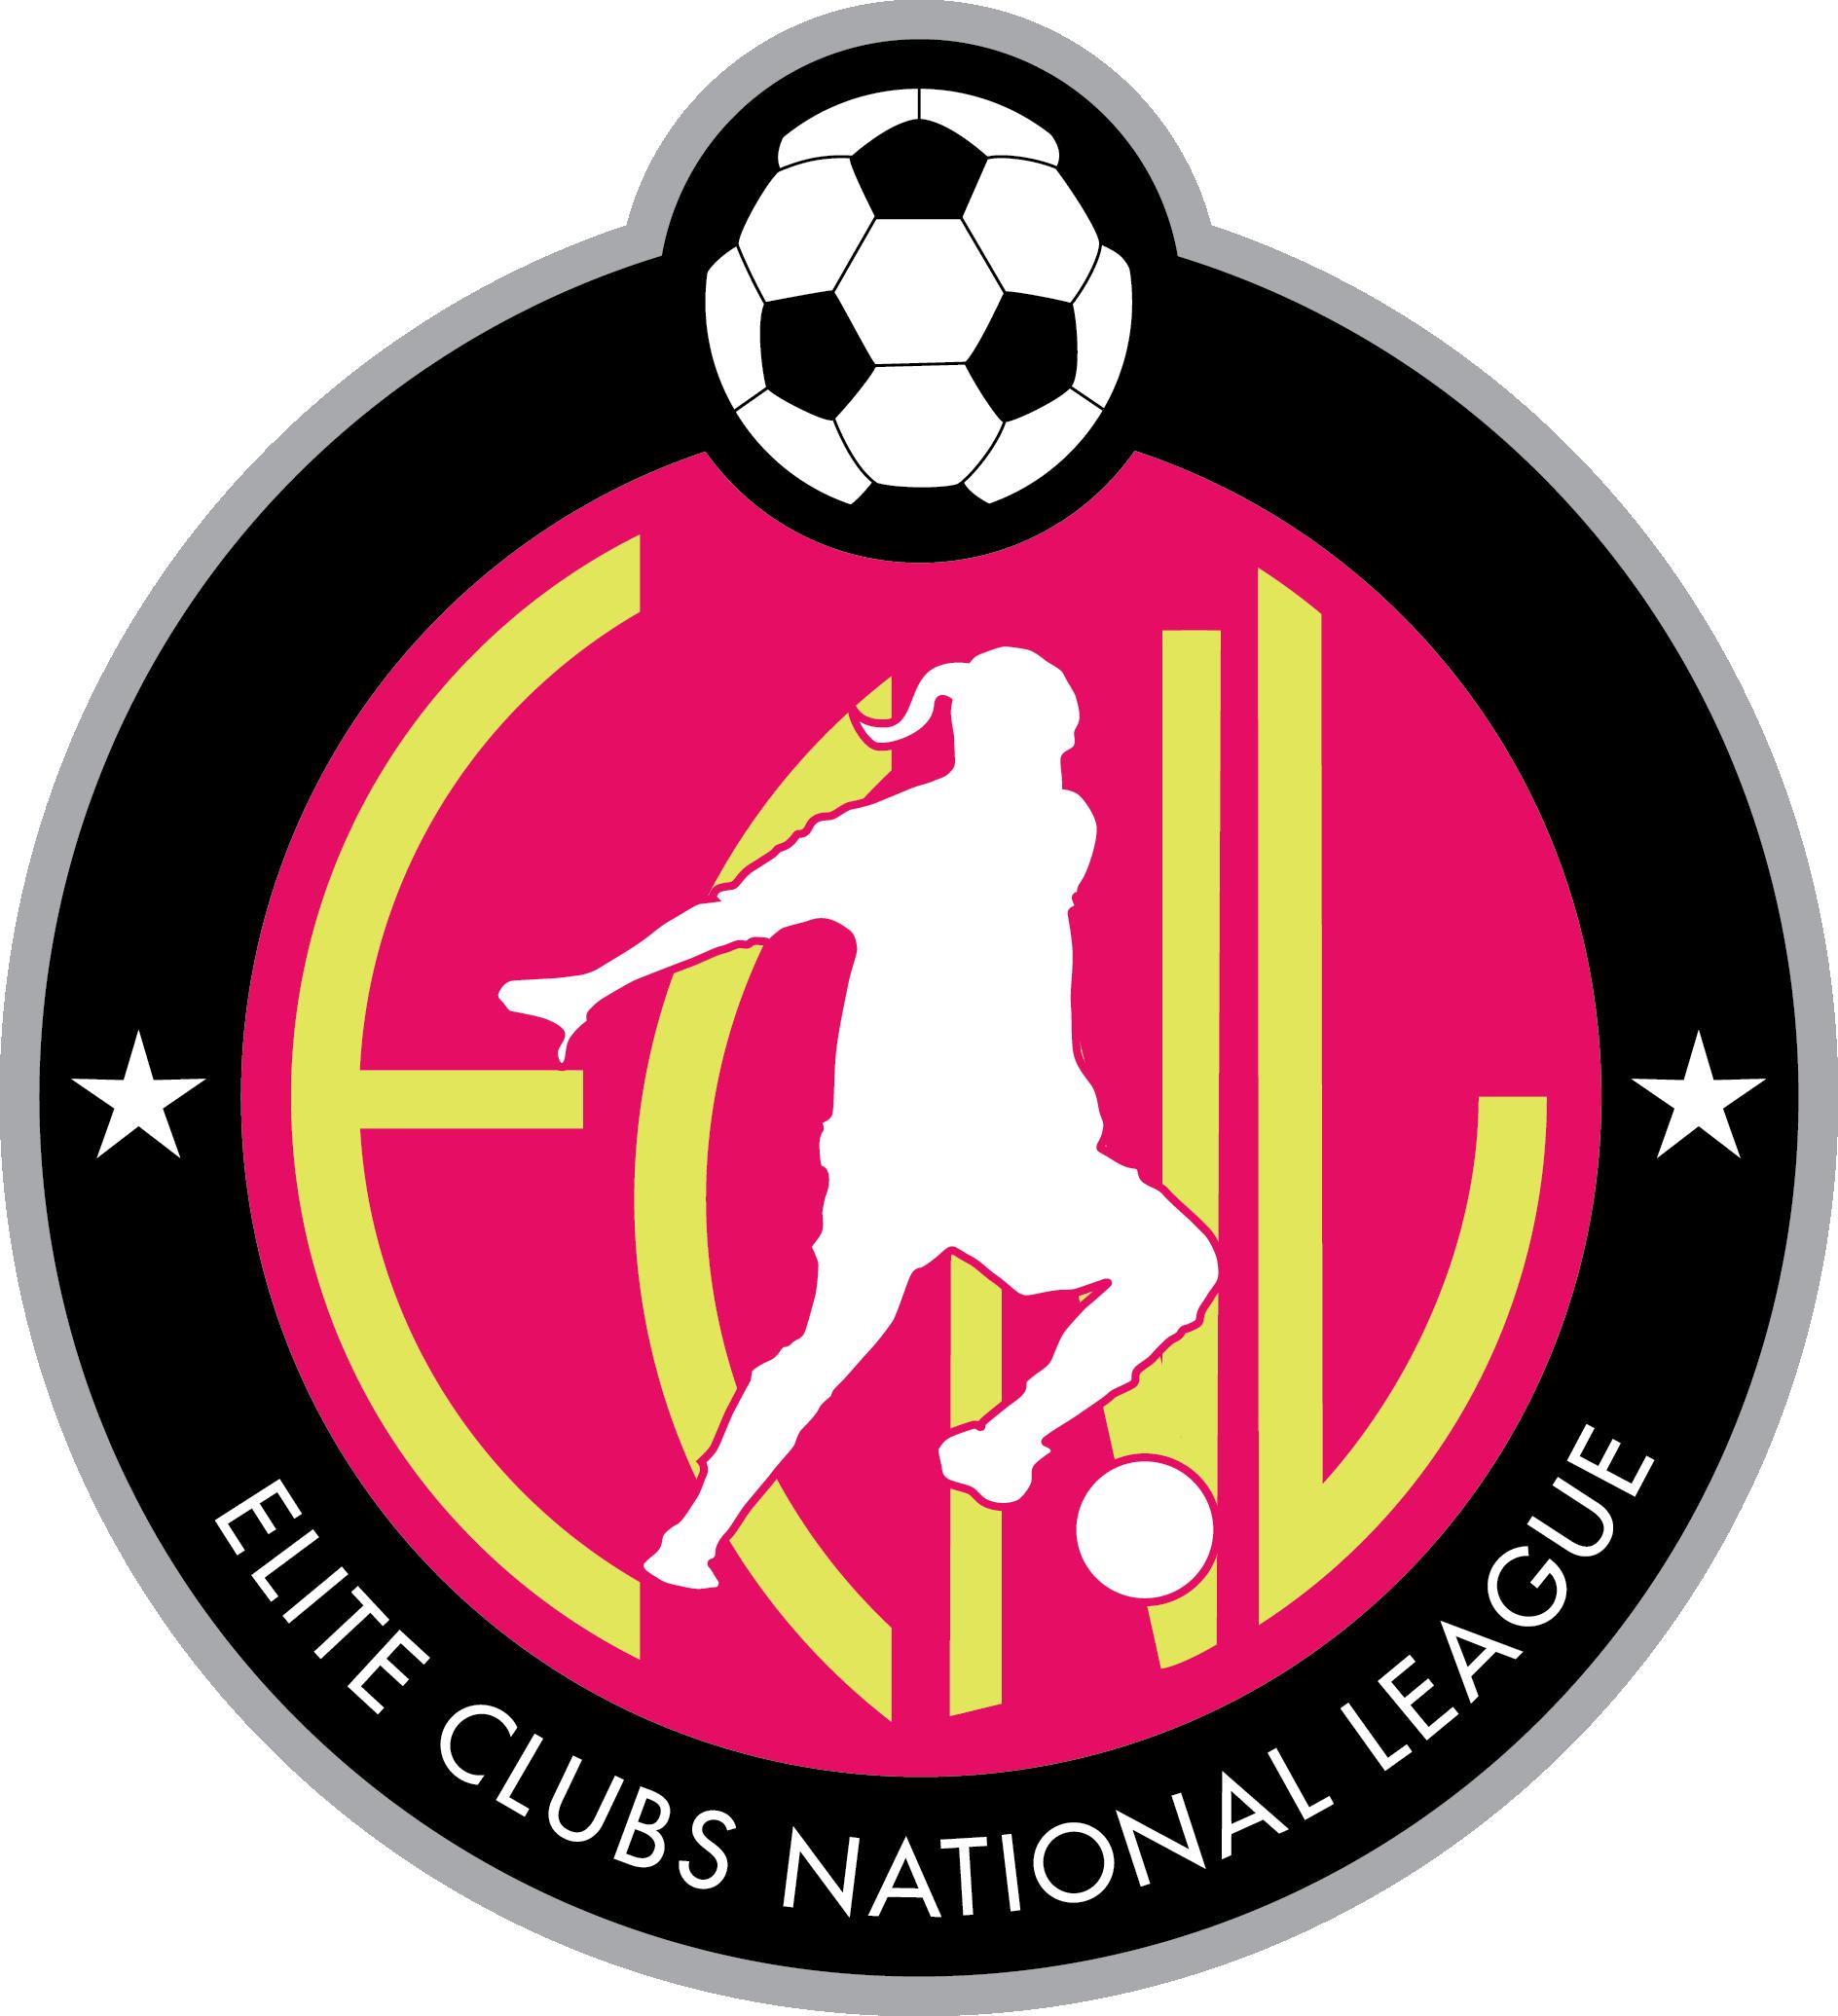 Elite Club National League